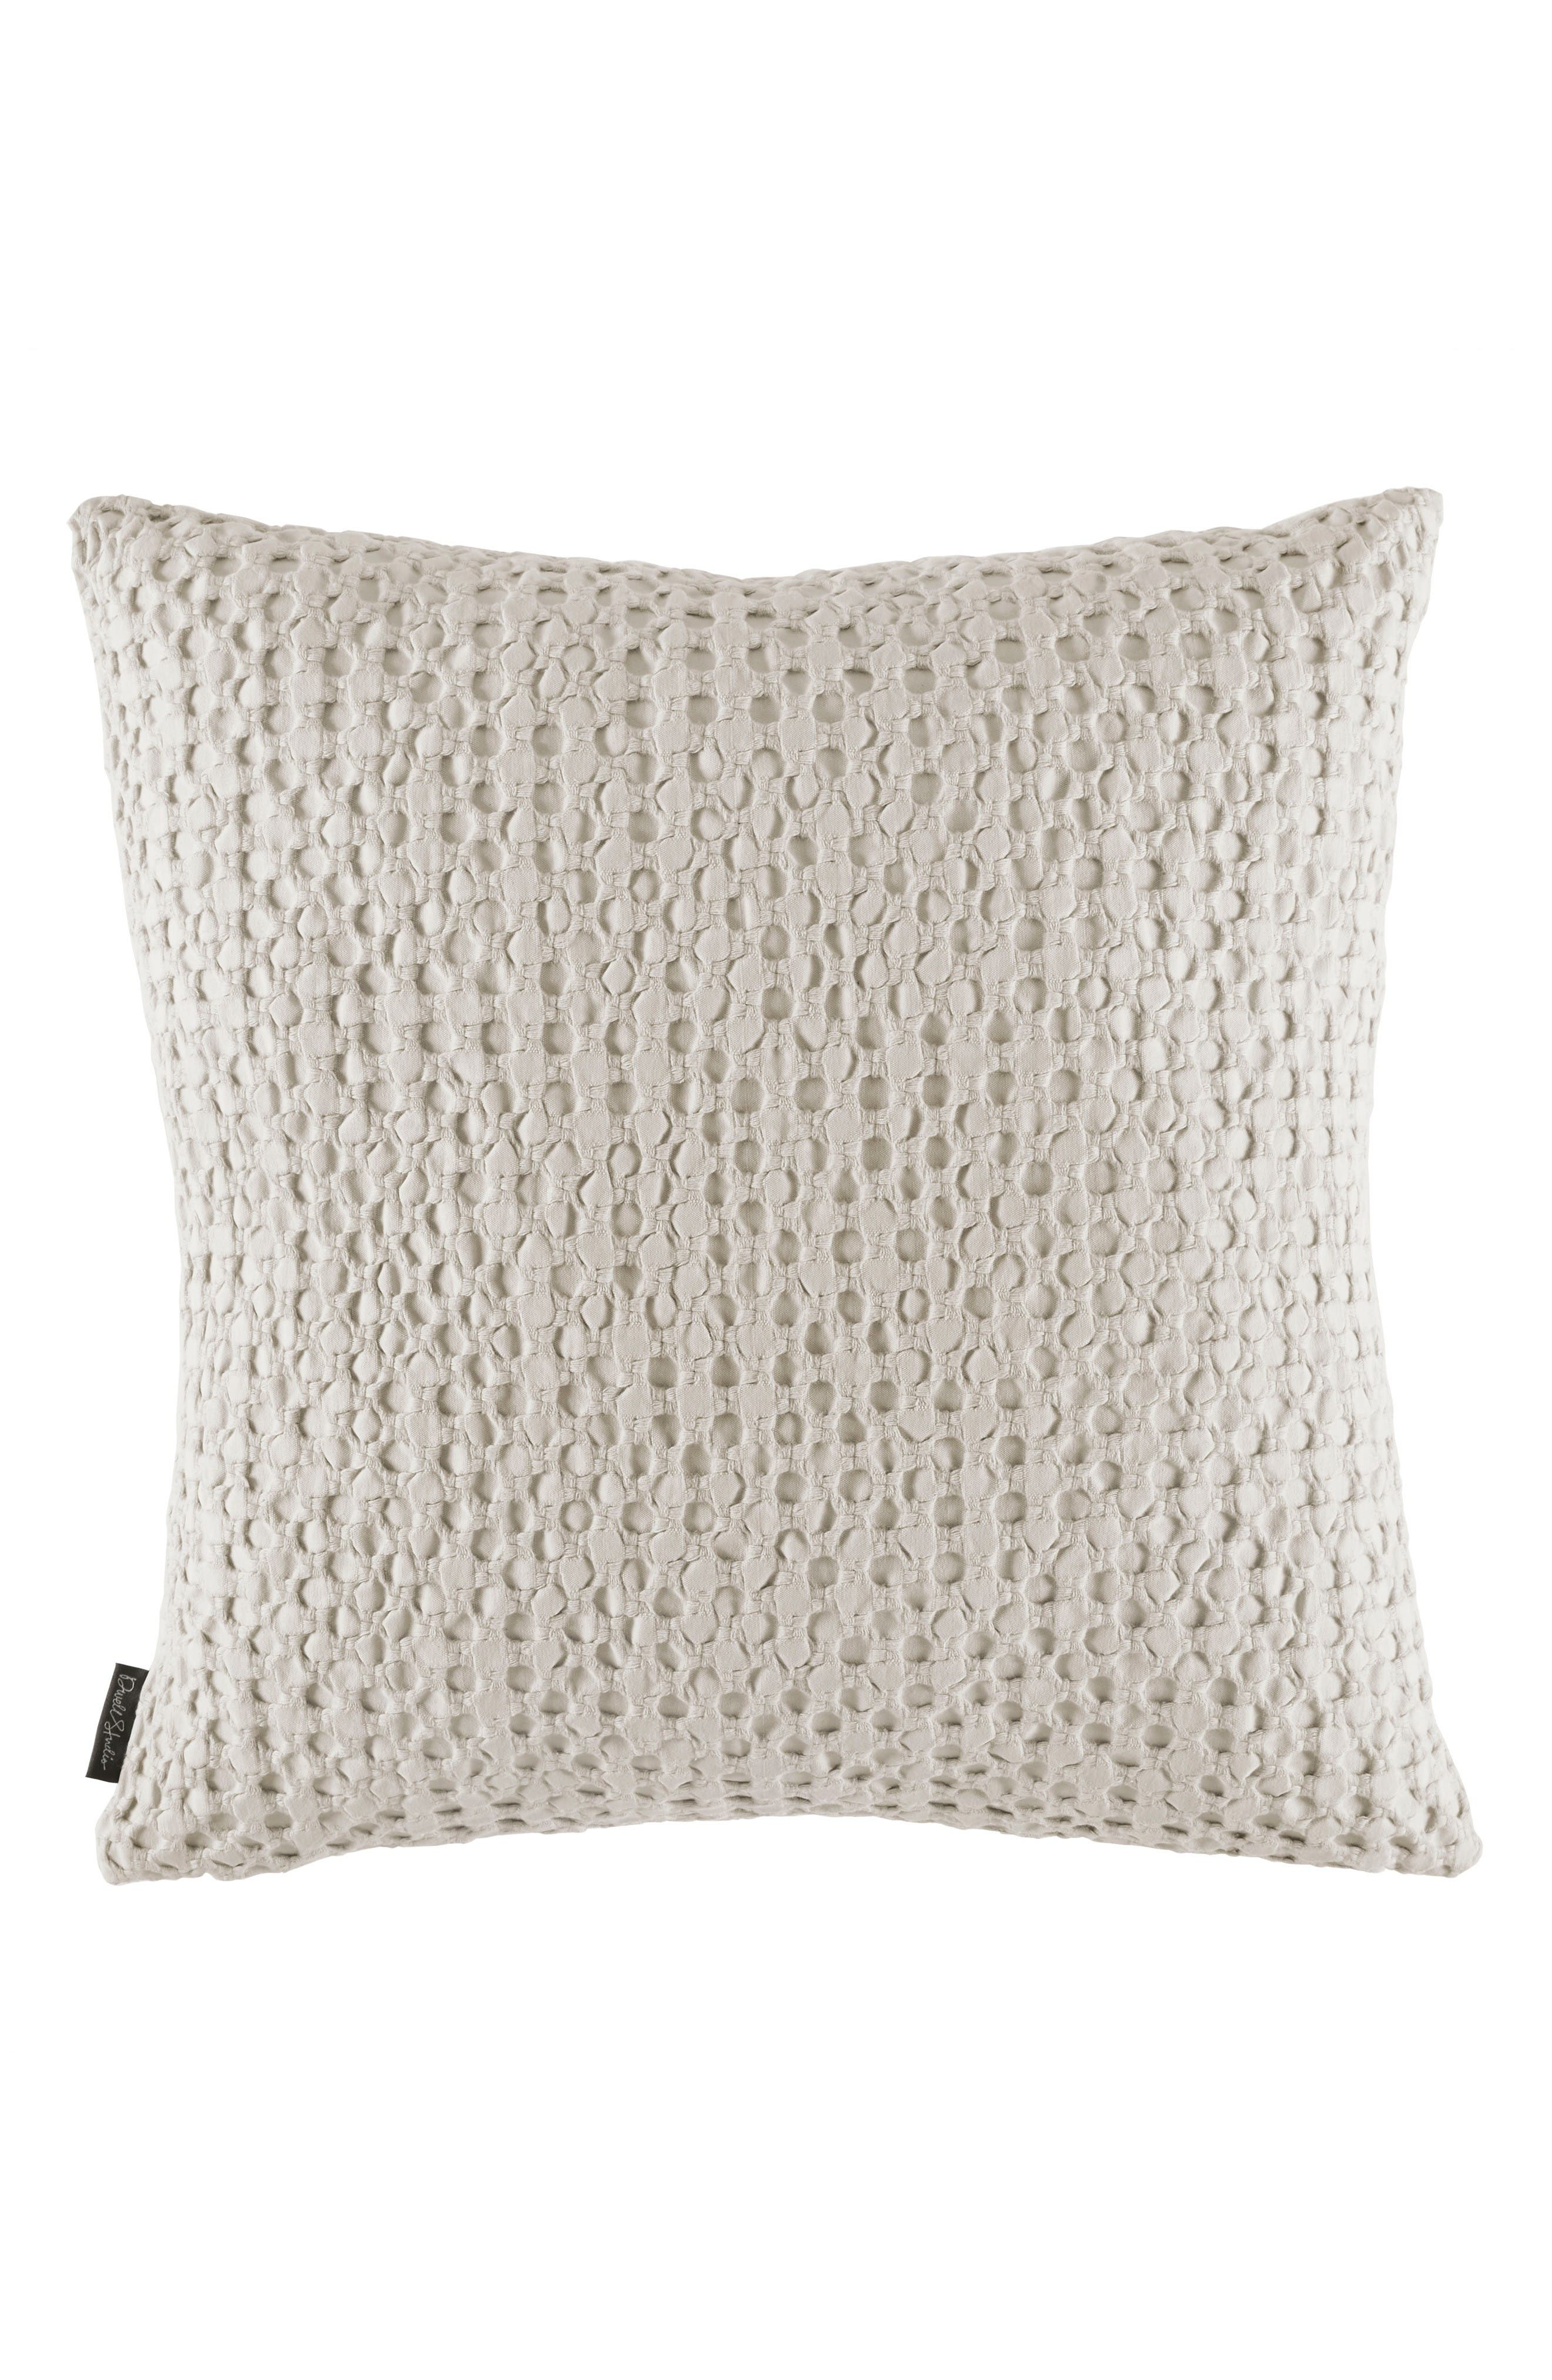 Main Image - DwellStudio Thayer Accent Pillow